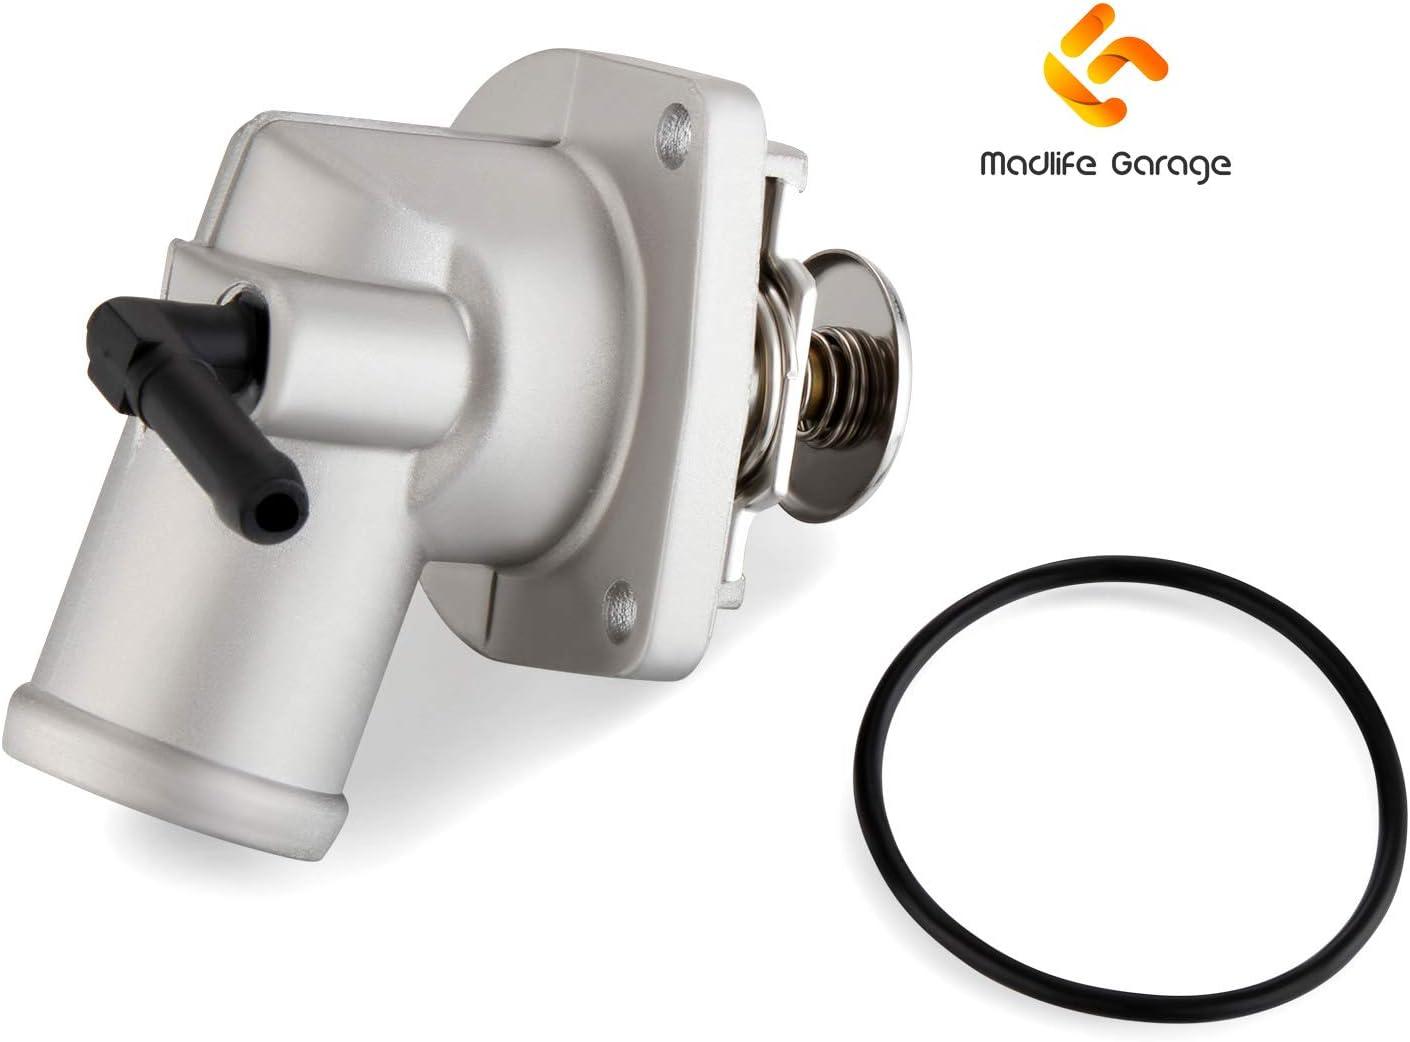 Madlife Garage Thermostatgeh/äuse mit Dichtung 1338003 09129907 f/ür Astra G Meriva Zafira Vectra Combo 1.4 1.6